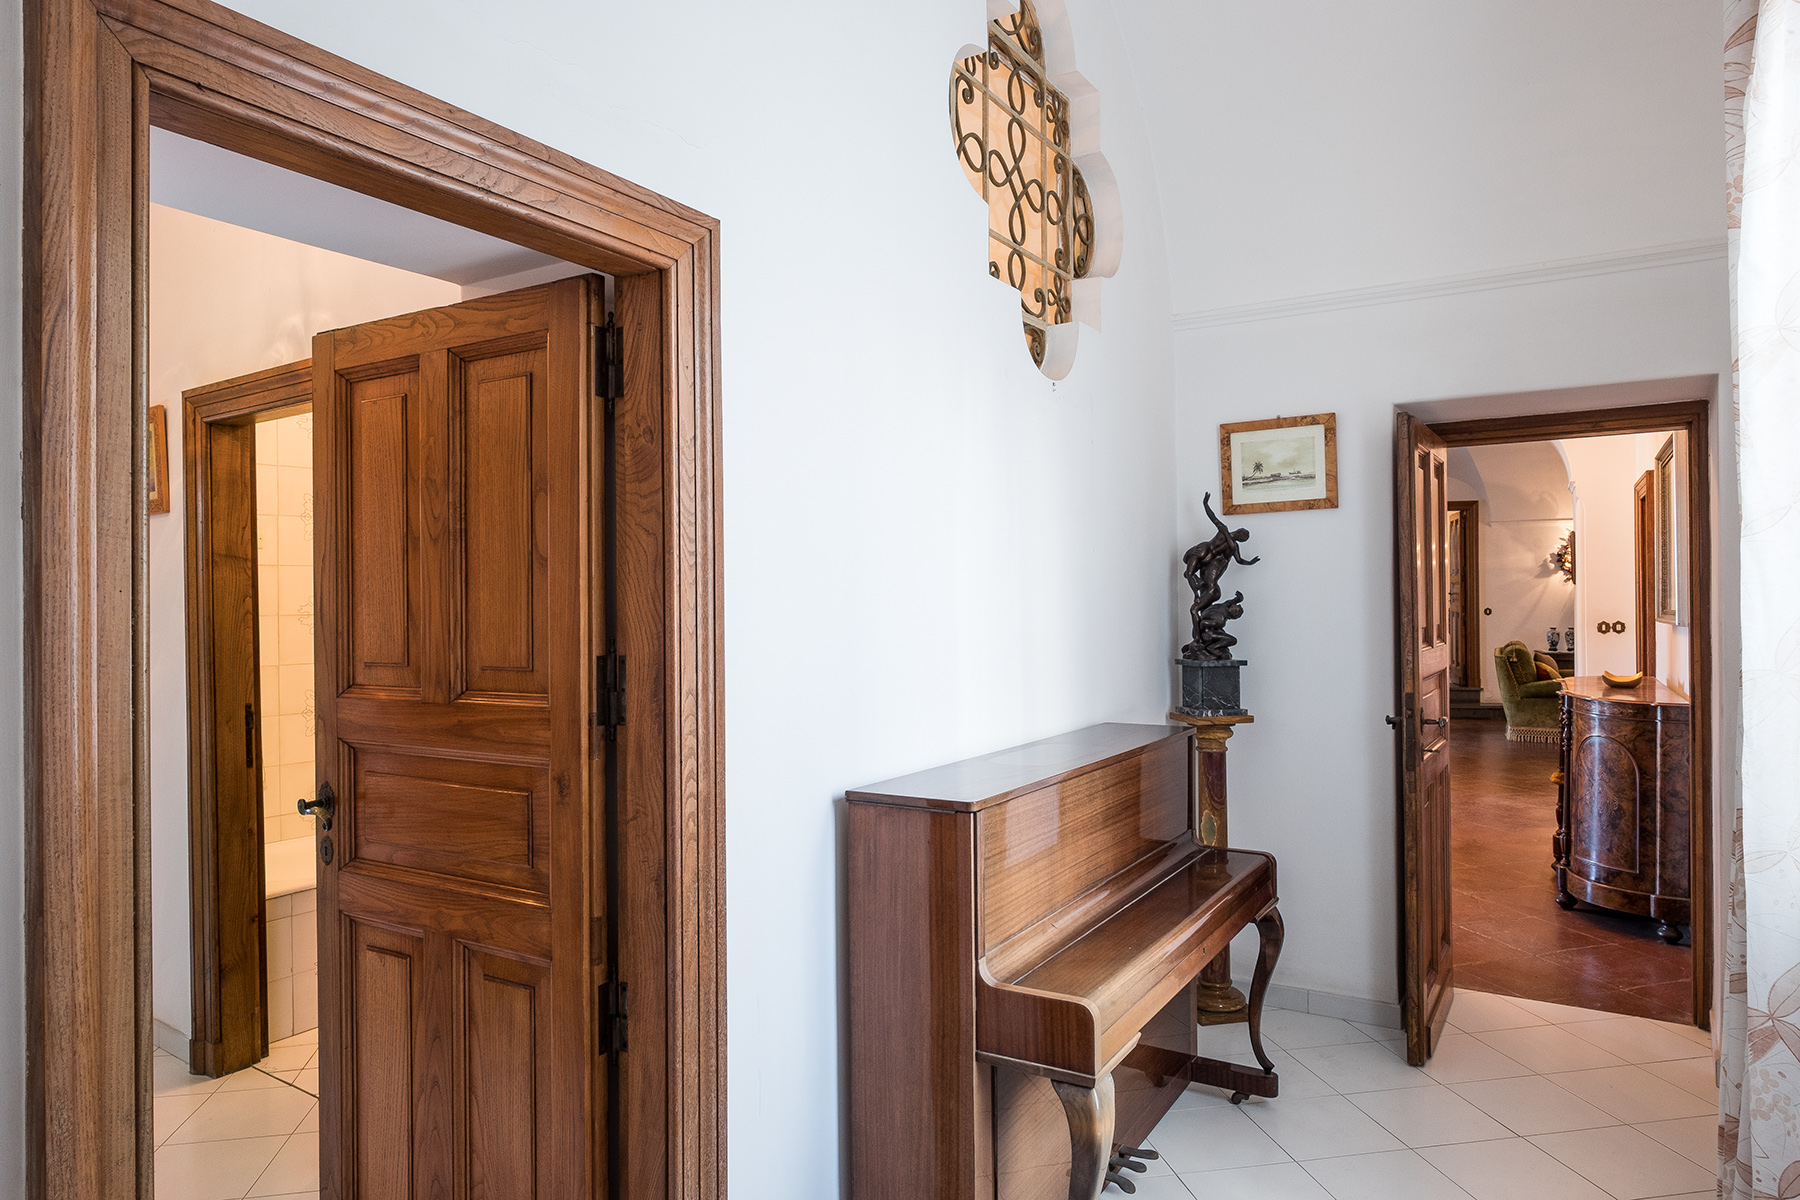 Casa indipendente in Vendita a Capri: 5 locali, 400 mq - Foto 15